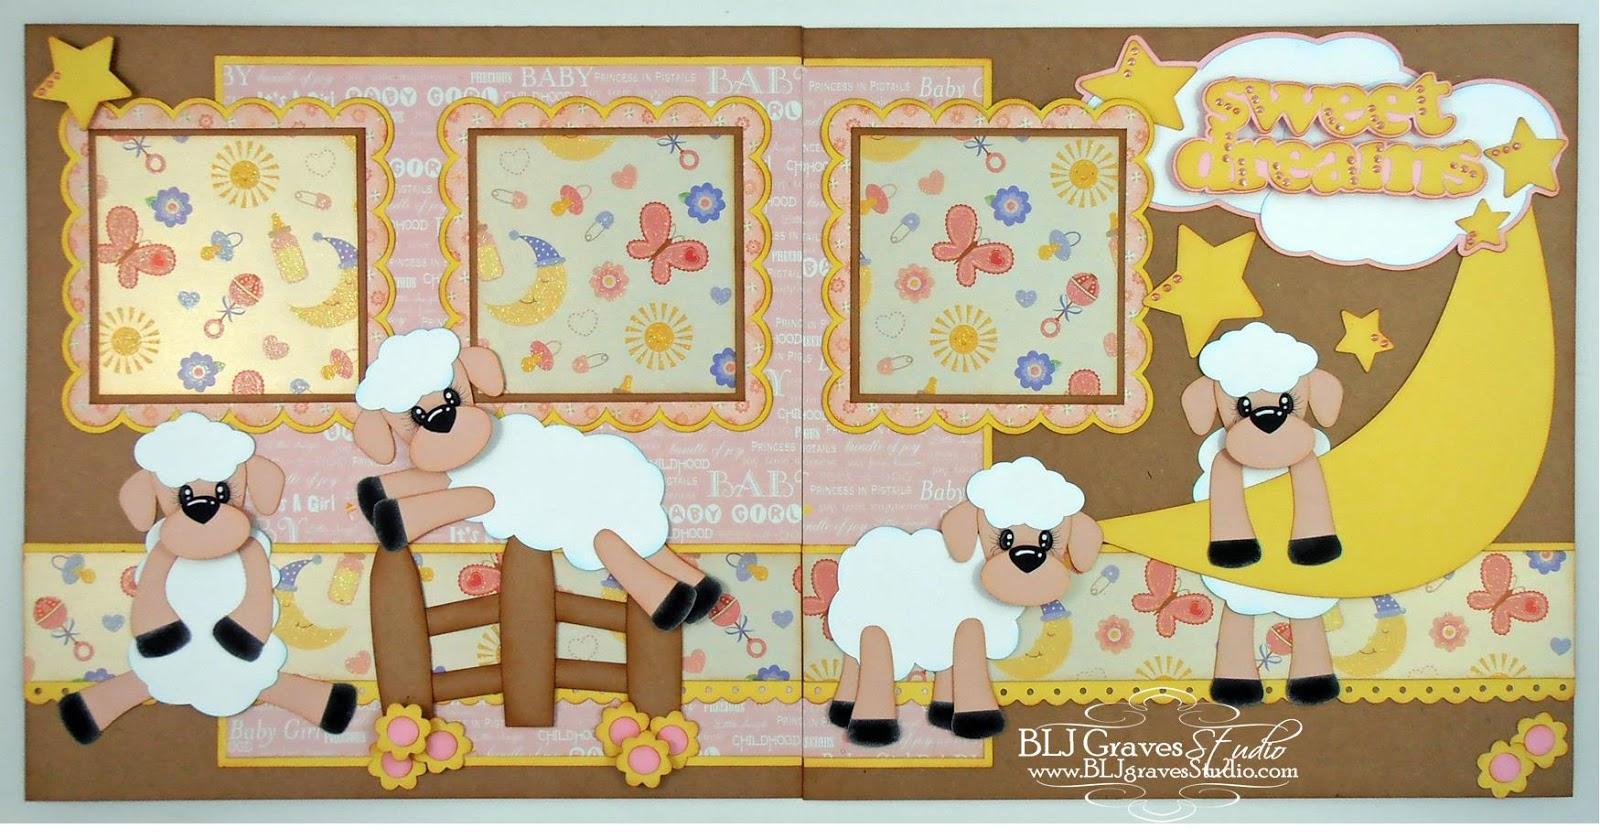 BLJ Graves Studio: Sweet Dreams Baby Scrapbook Pages